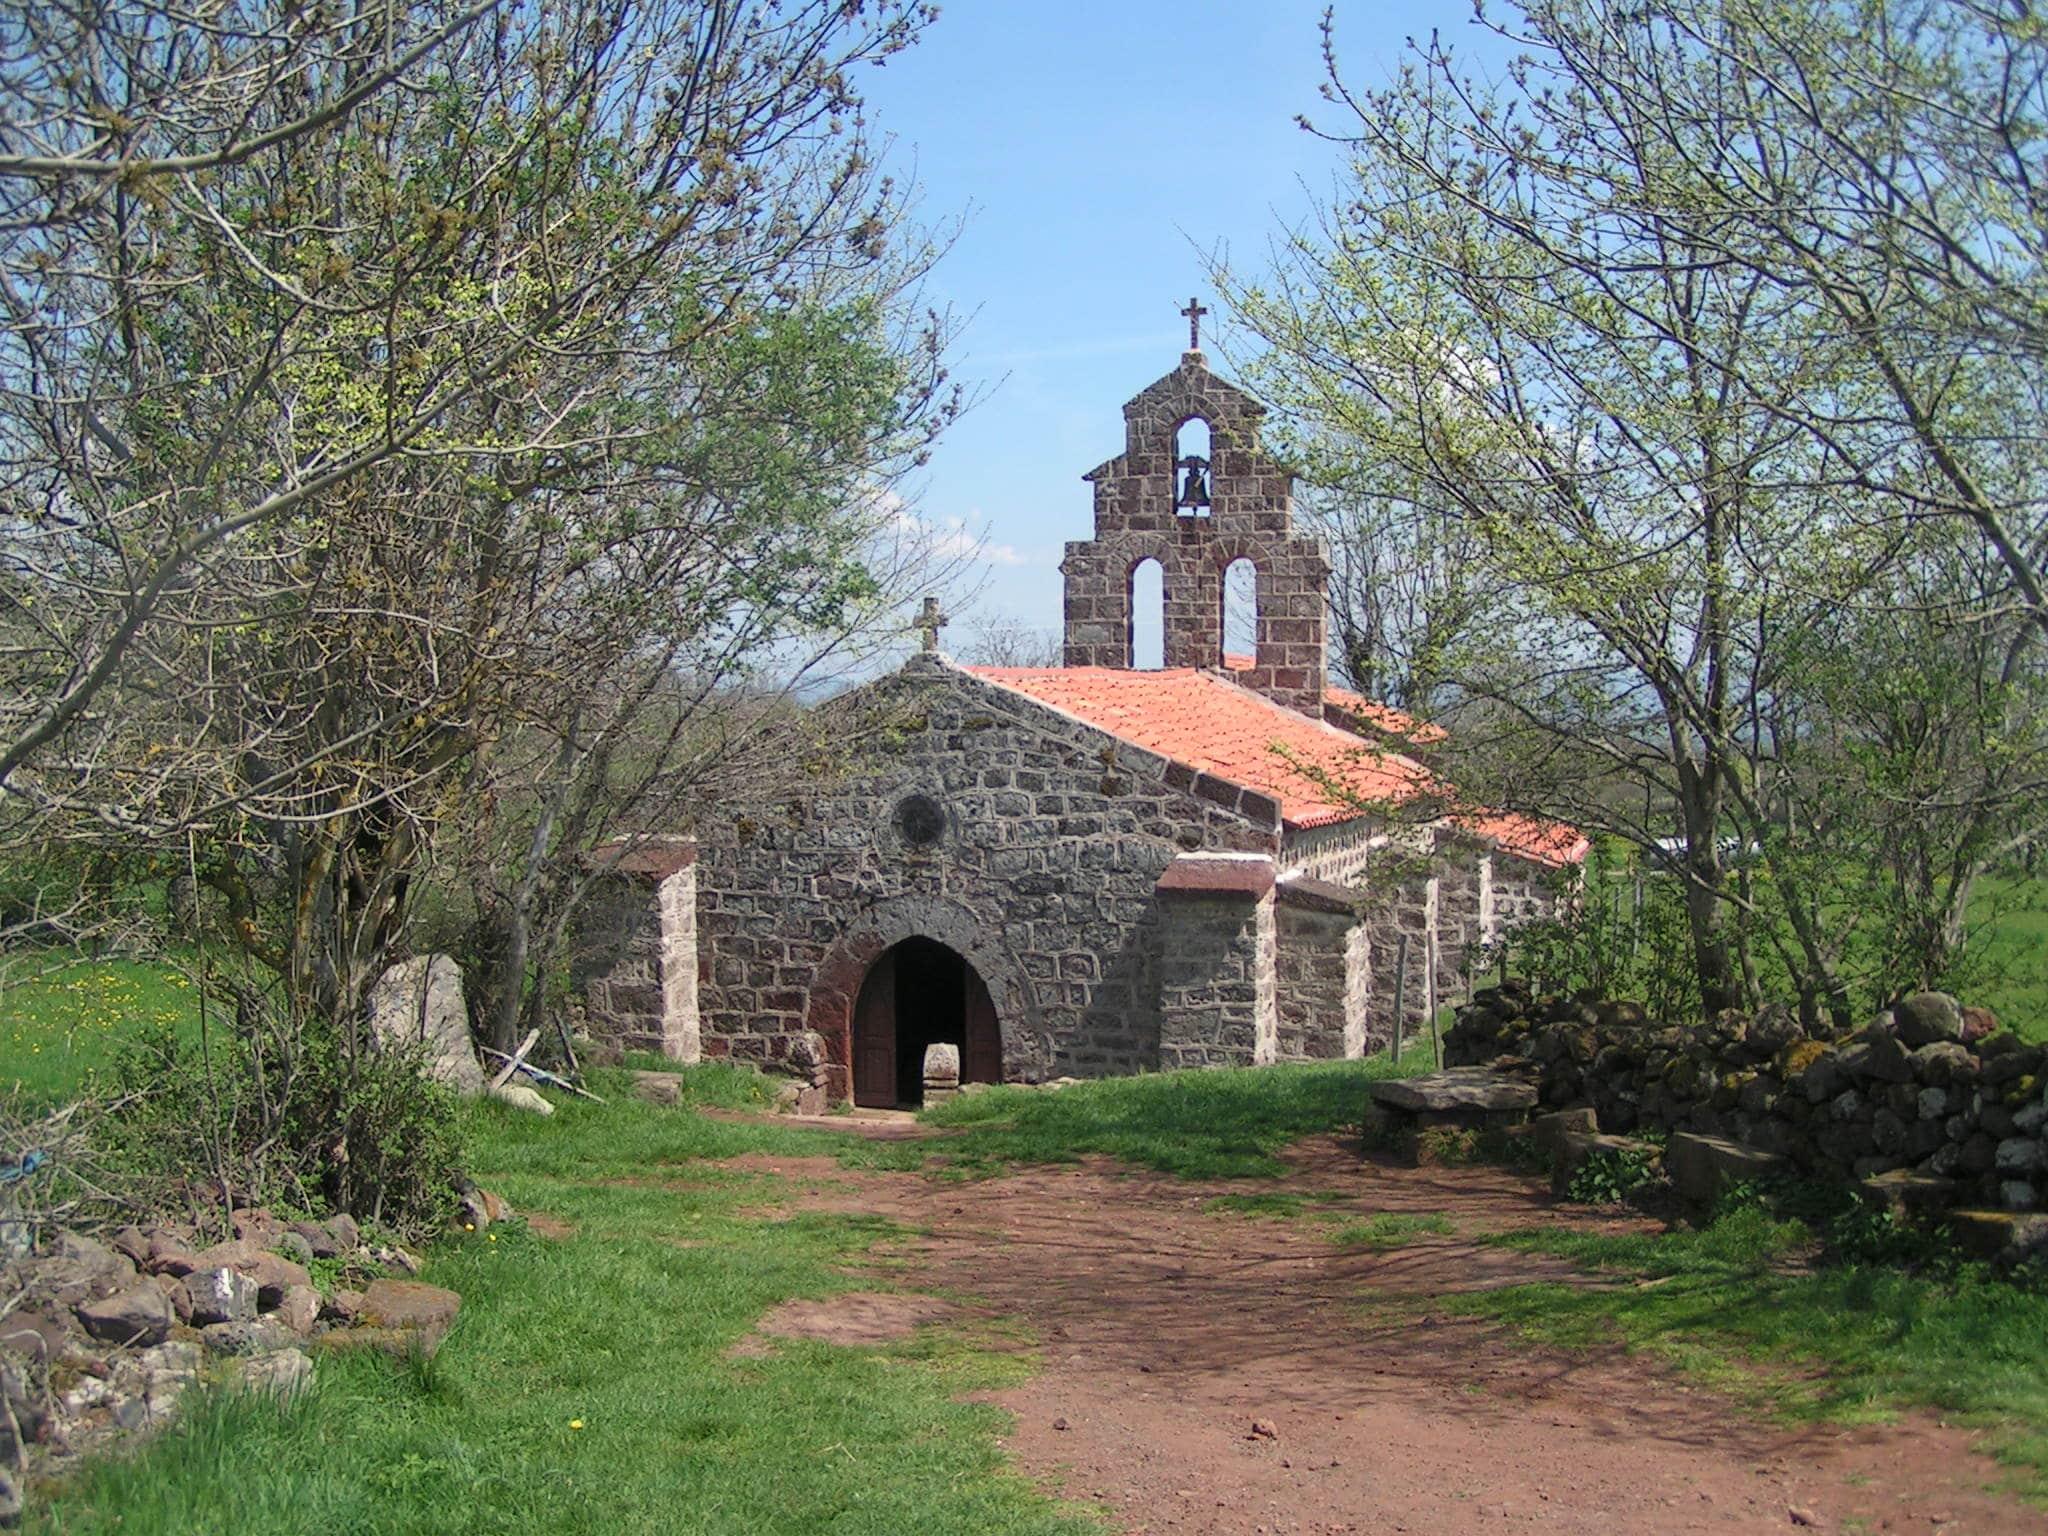 Chapel of St. Roch, Montbonnet, France